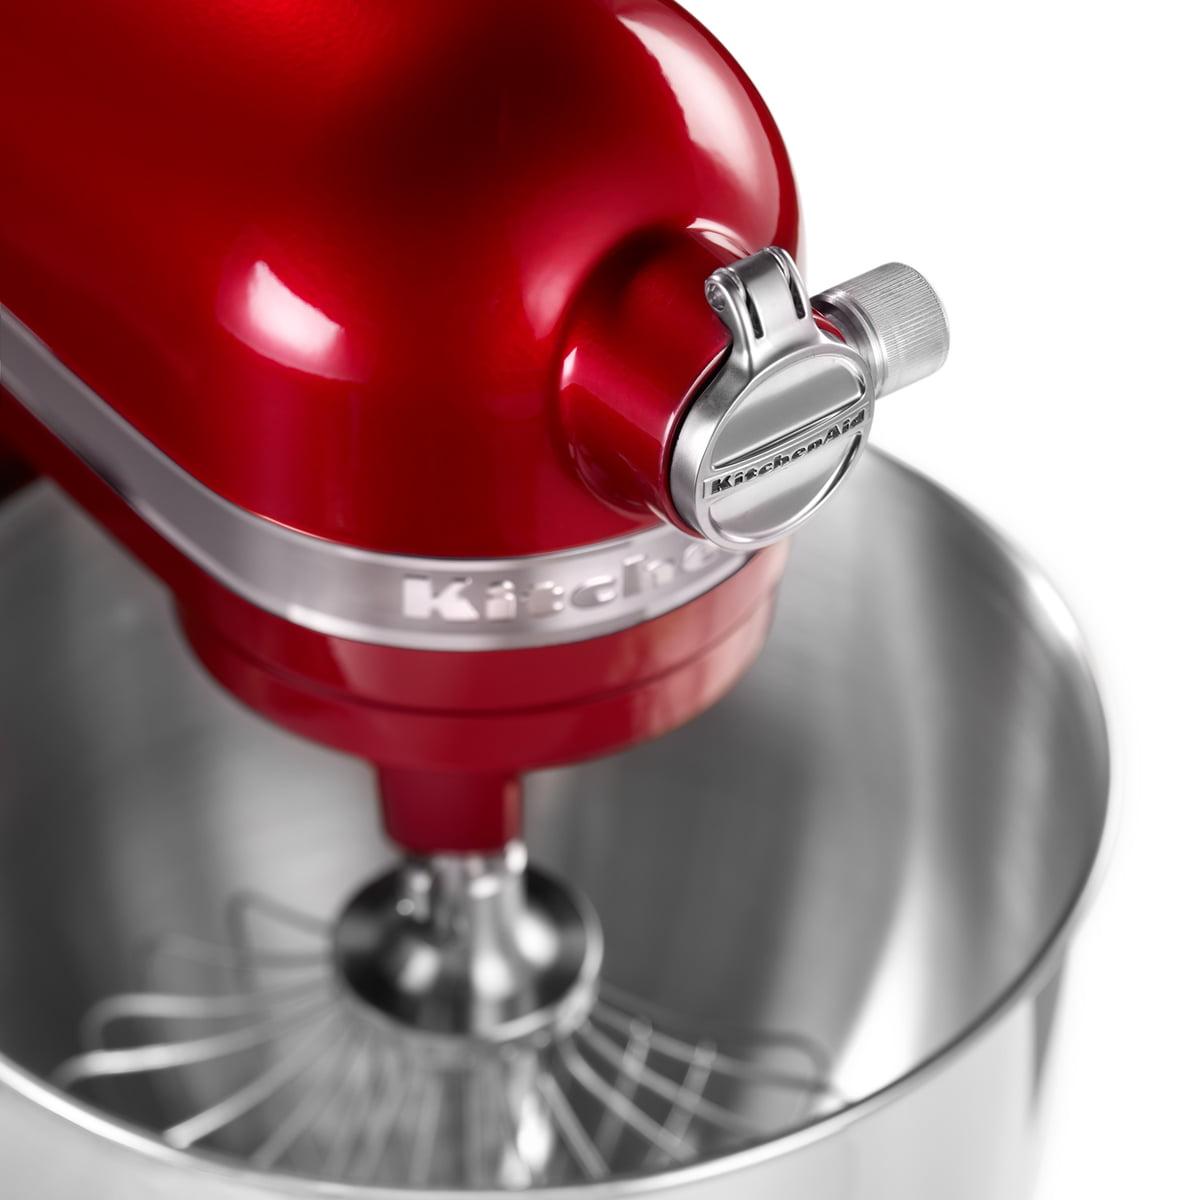 Kitchenaid Küchenmaschine Artisan Rot 5ksm150pseer: Liter